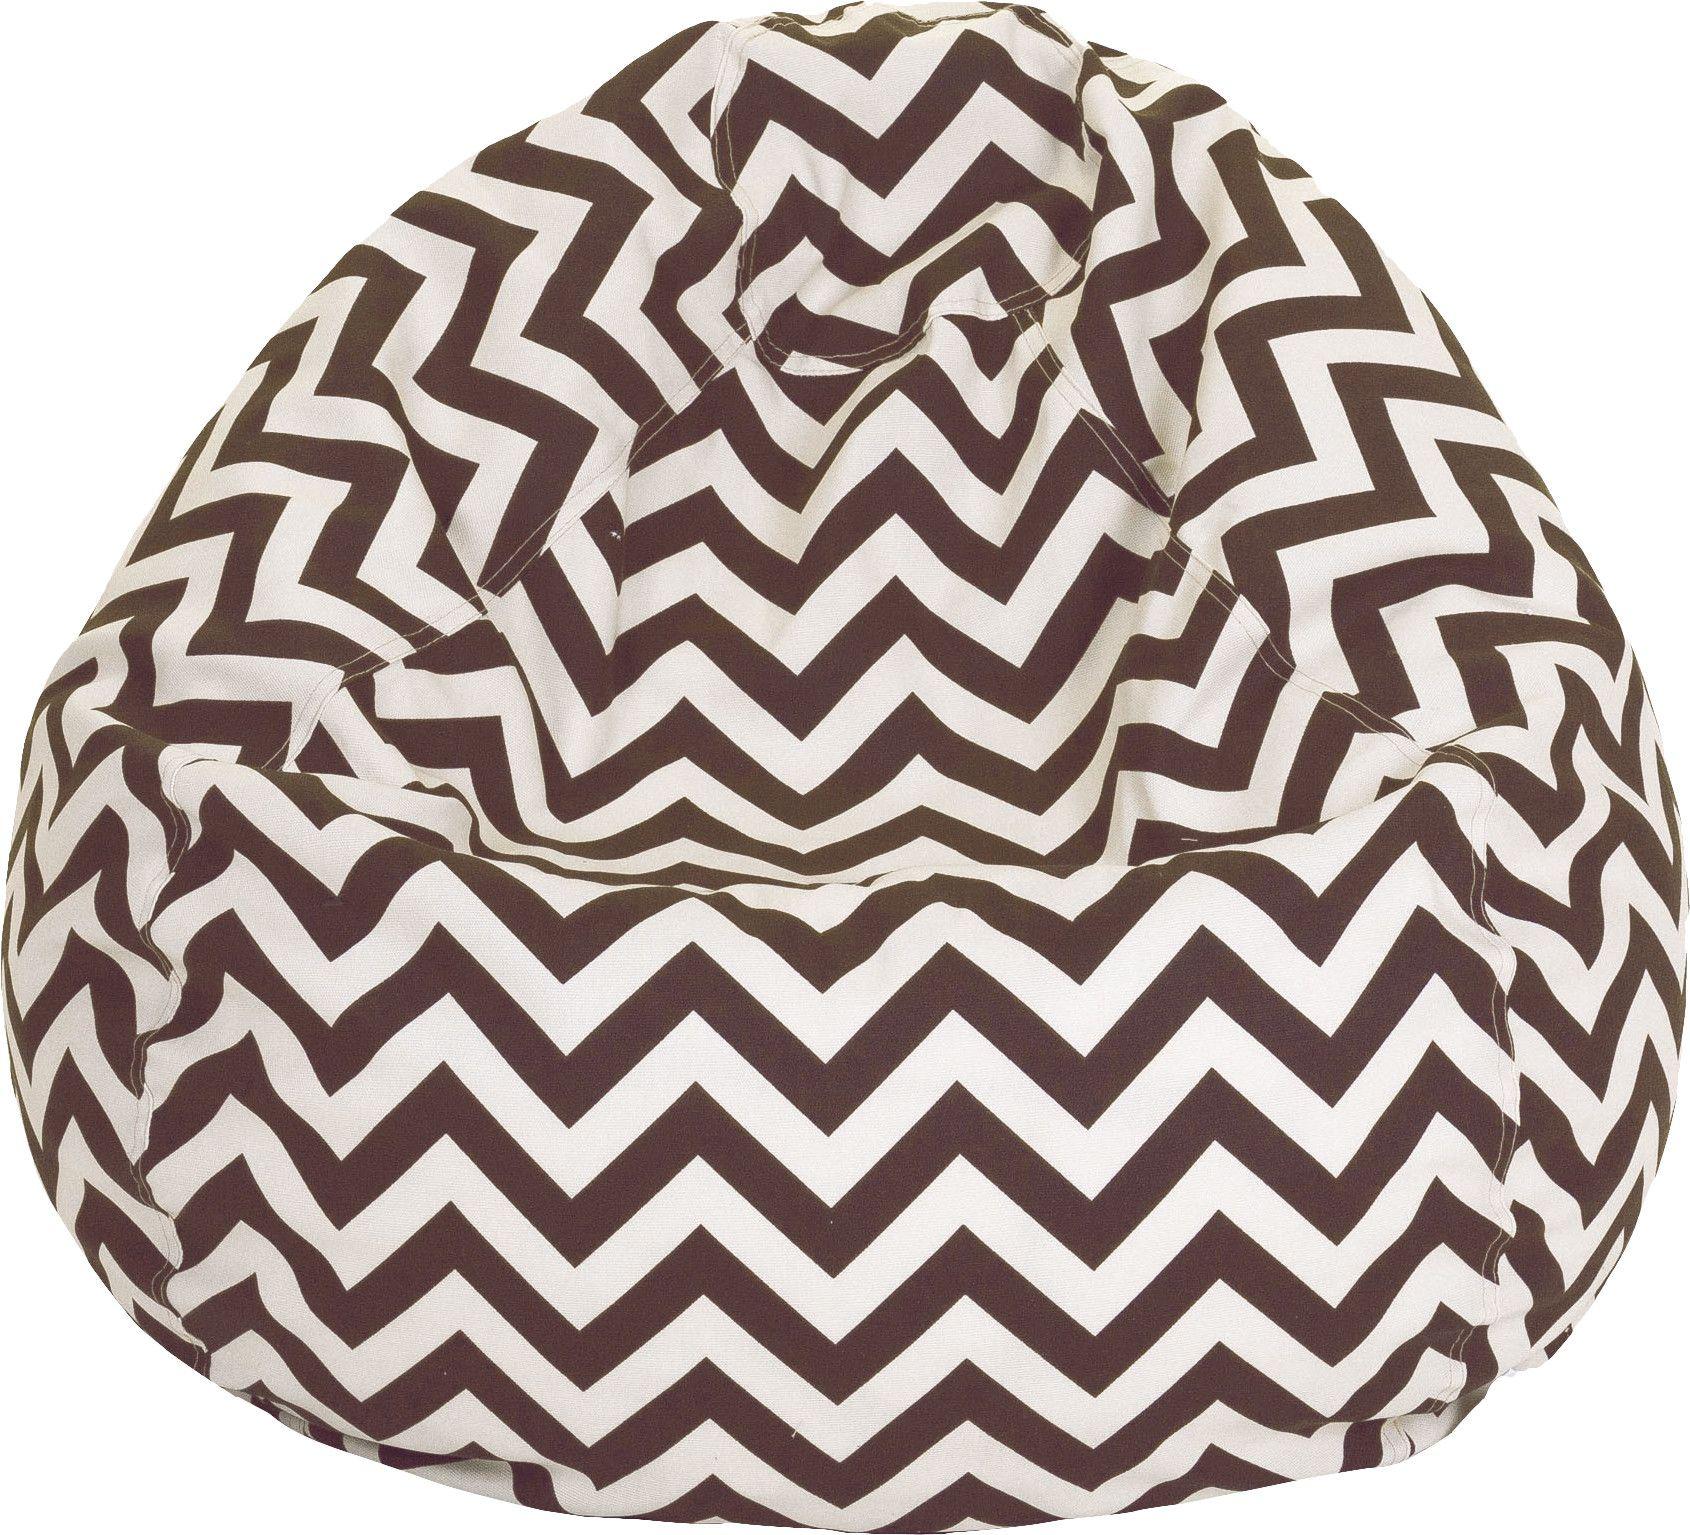 Pin by 💛💛💛 Логунова on Моя комната Bean bag chair, Bean